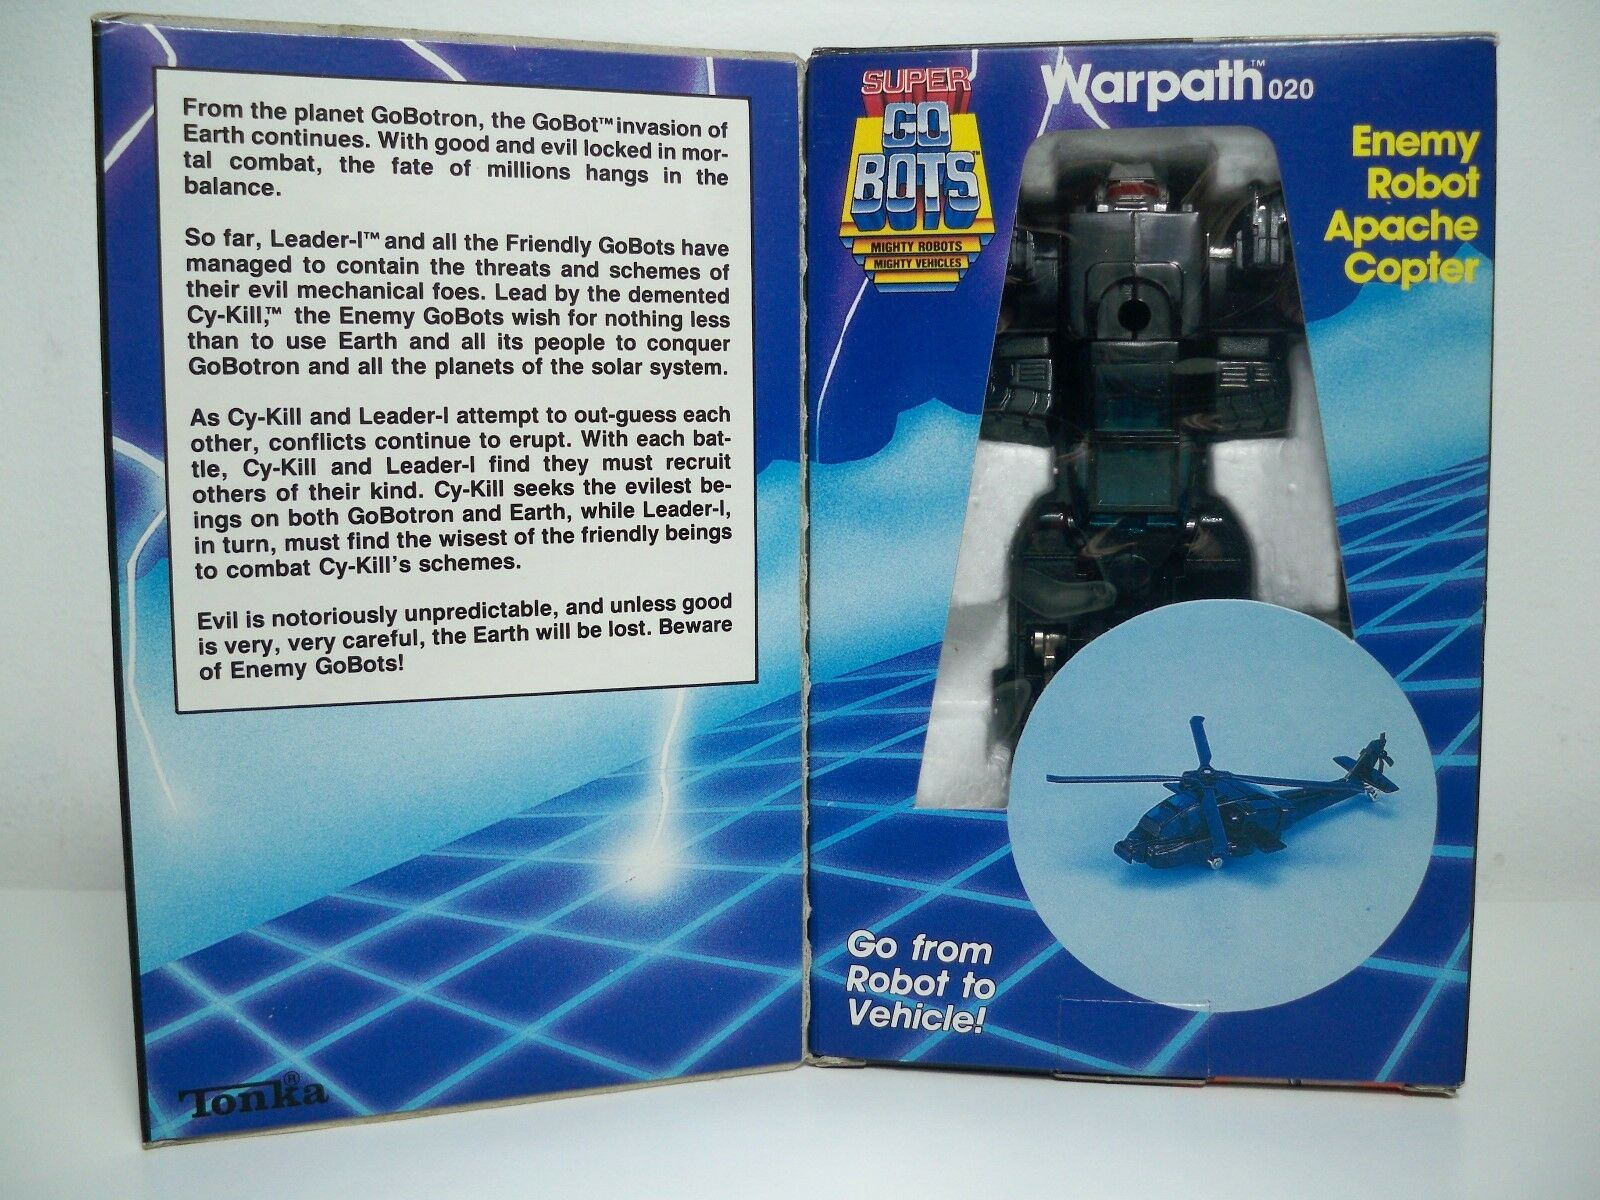 K1701831 WARPATH W/ BOX & UNUSED DECALS SUPER GOBOTS GOBOTS GOBOTS 100% COMPLETE 1984 ORIGINAL b35beb